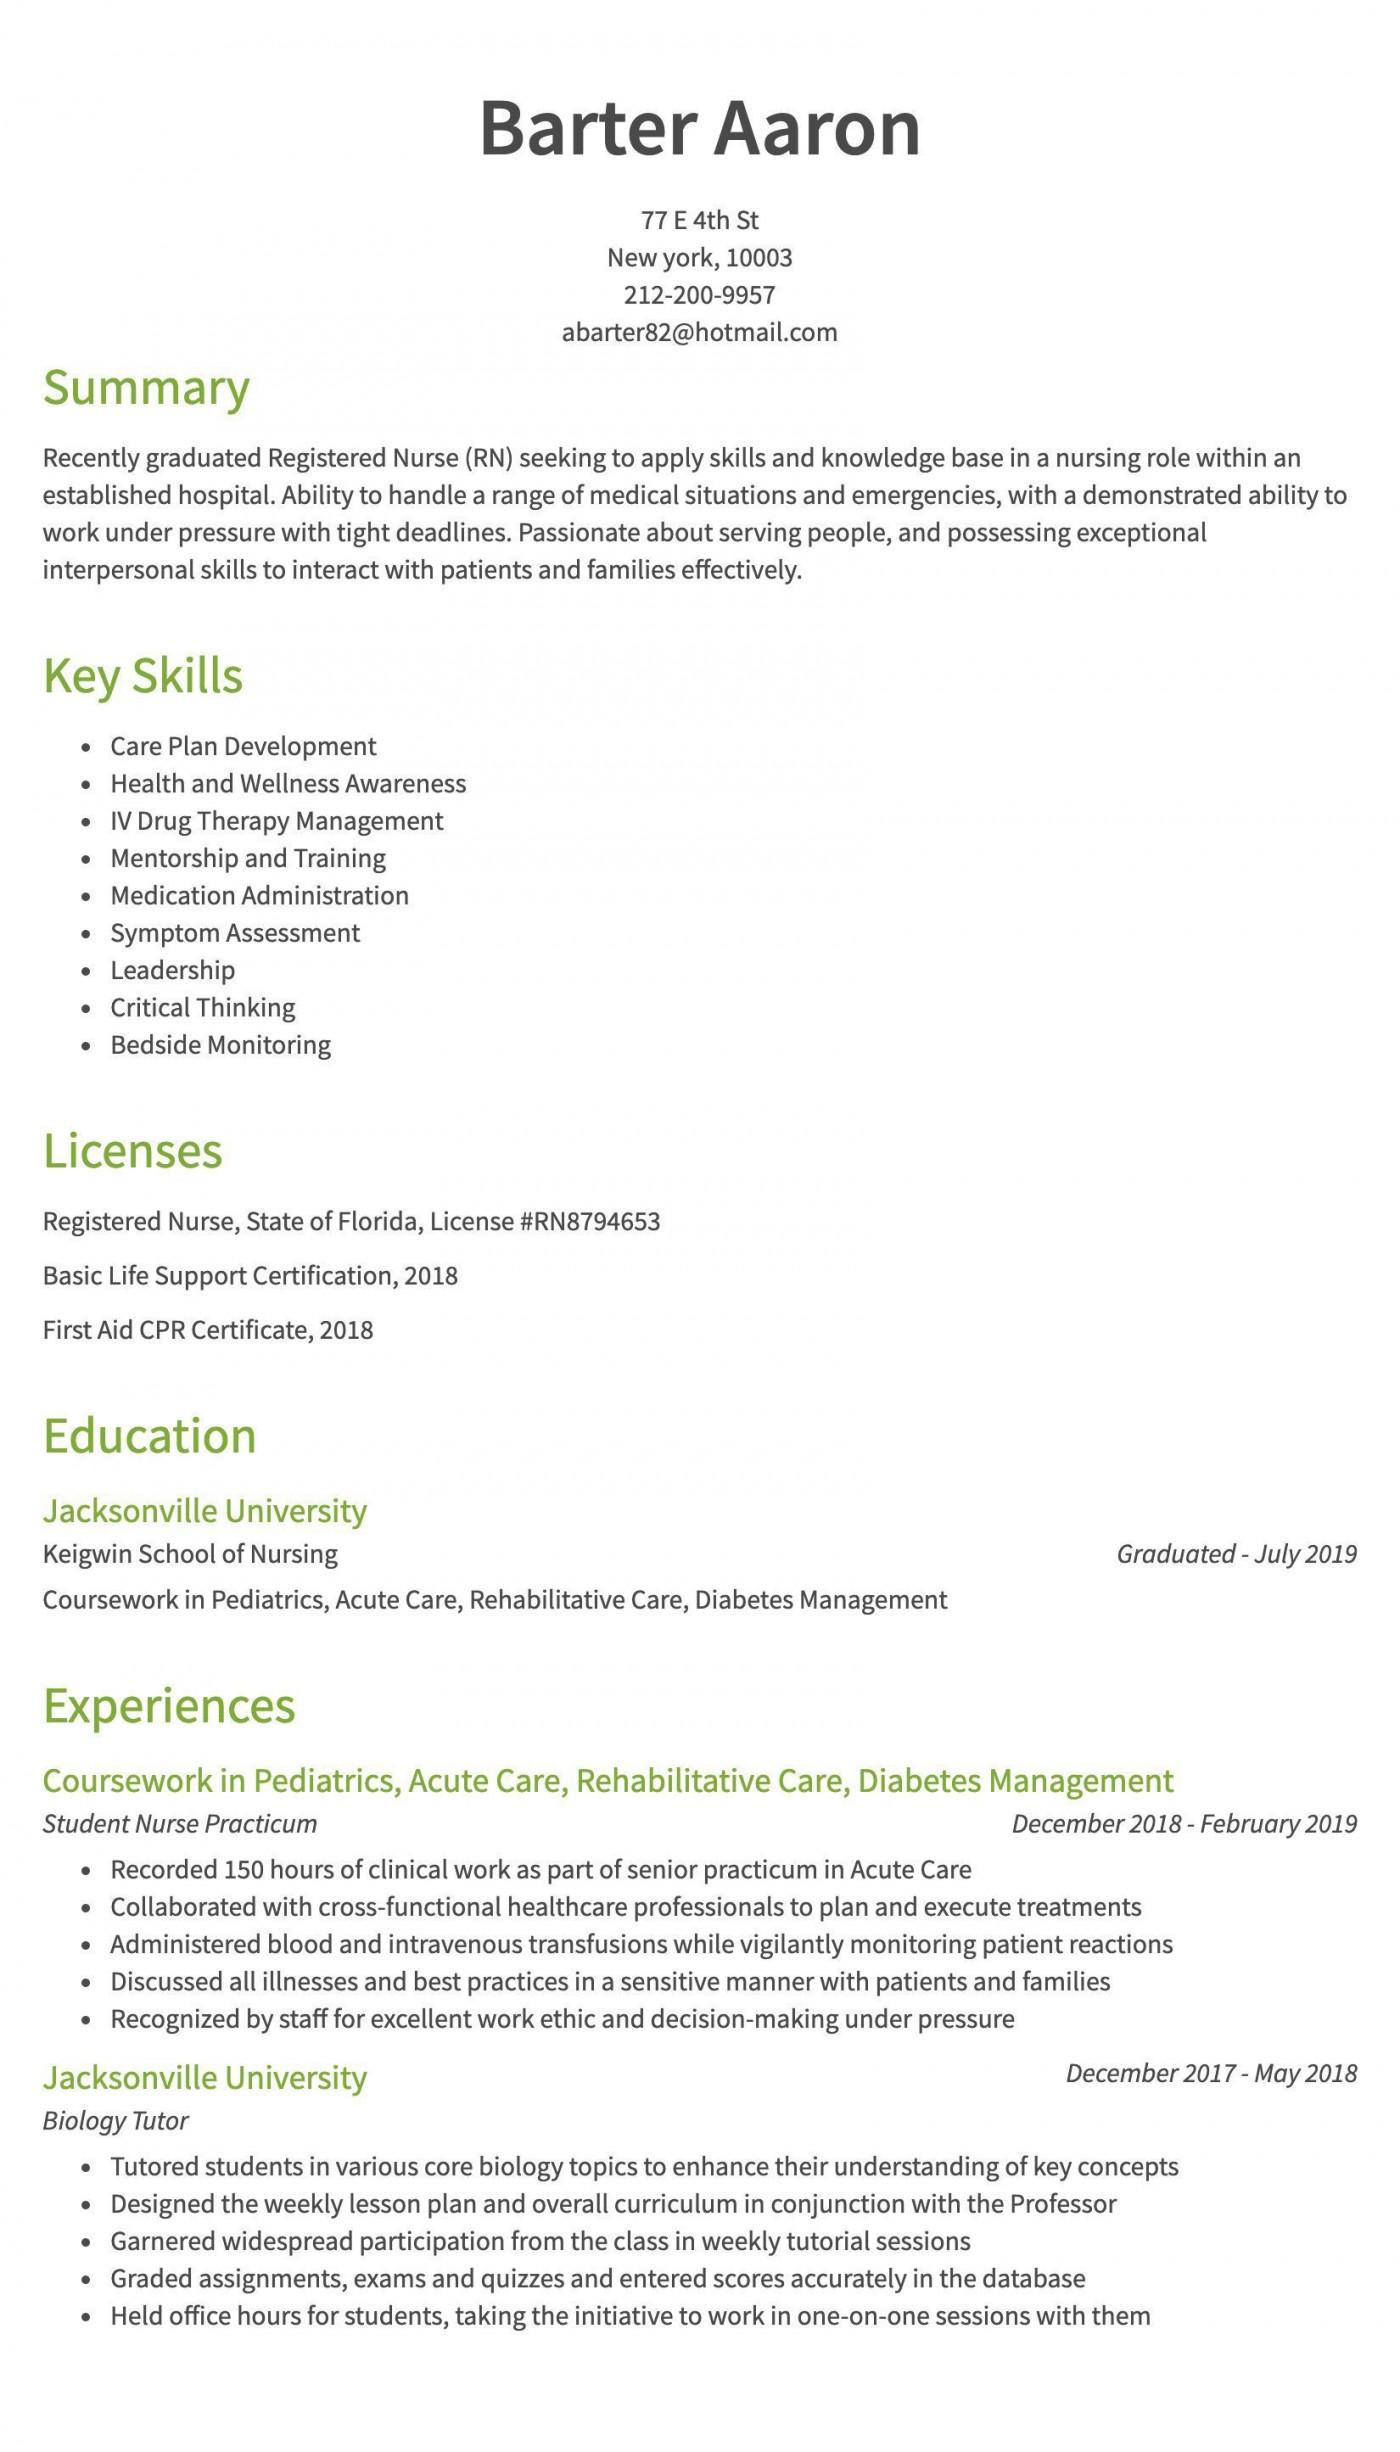 008 Remarkable Rn Graduate Resume Template High Resolution  New Grad Nurse1400